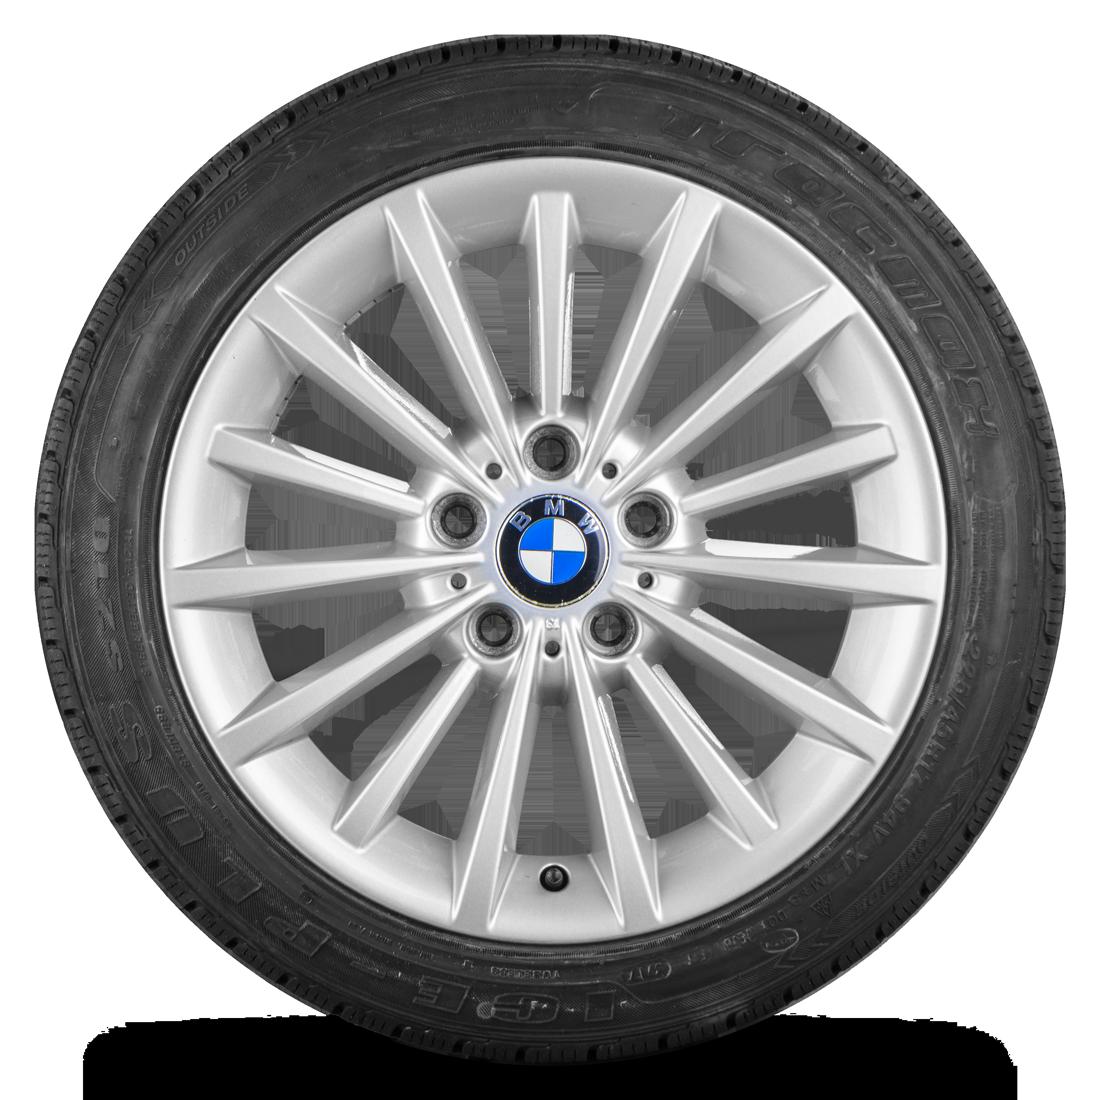 BMW 17 Zoll Felgen 3er E90 E91 E92 E93 Winterreifen Winterräder Styling 284